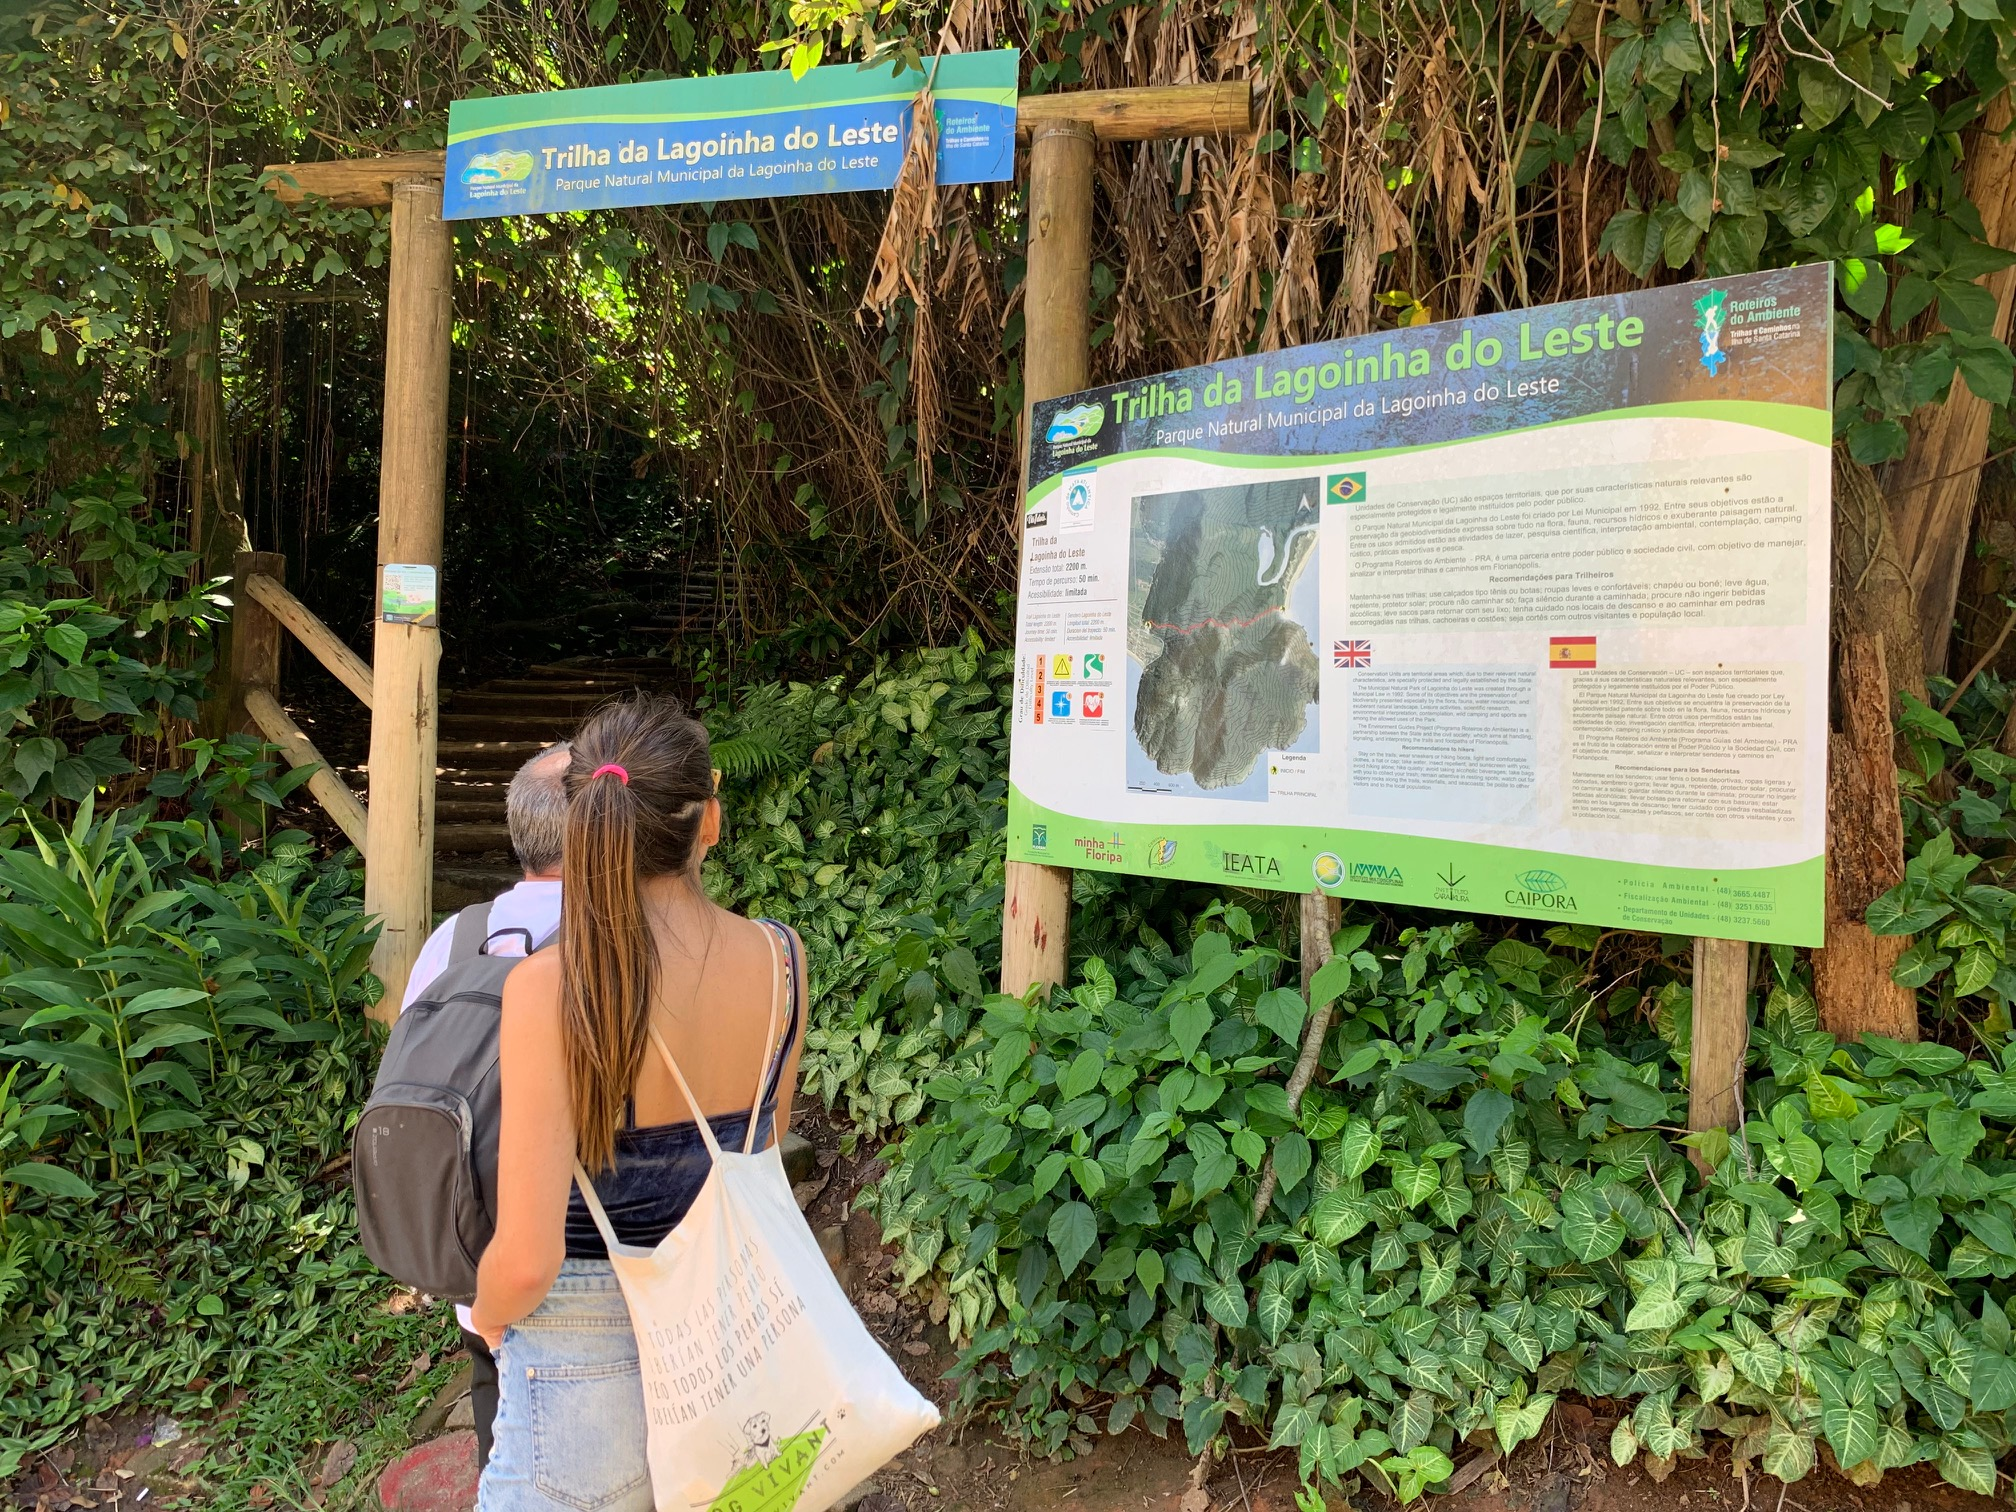 Comienzo del trekking a Lagoinha do Leste; a 100 metros de la carretera de Pantano do Sul